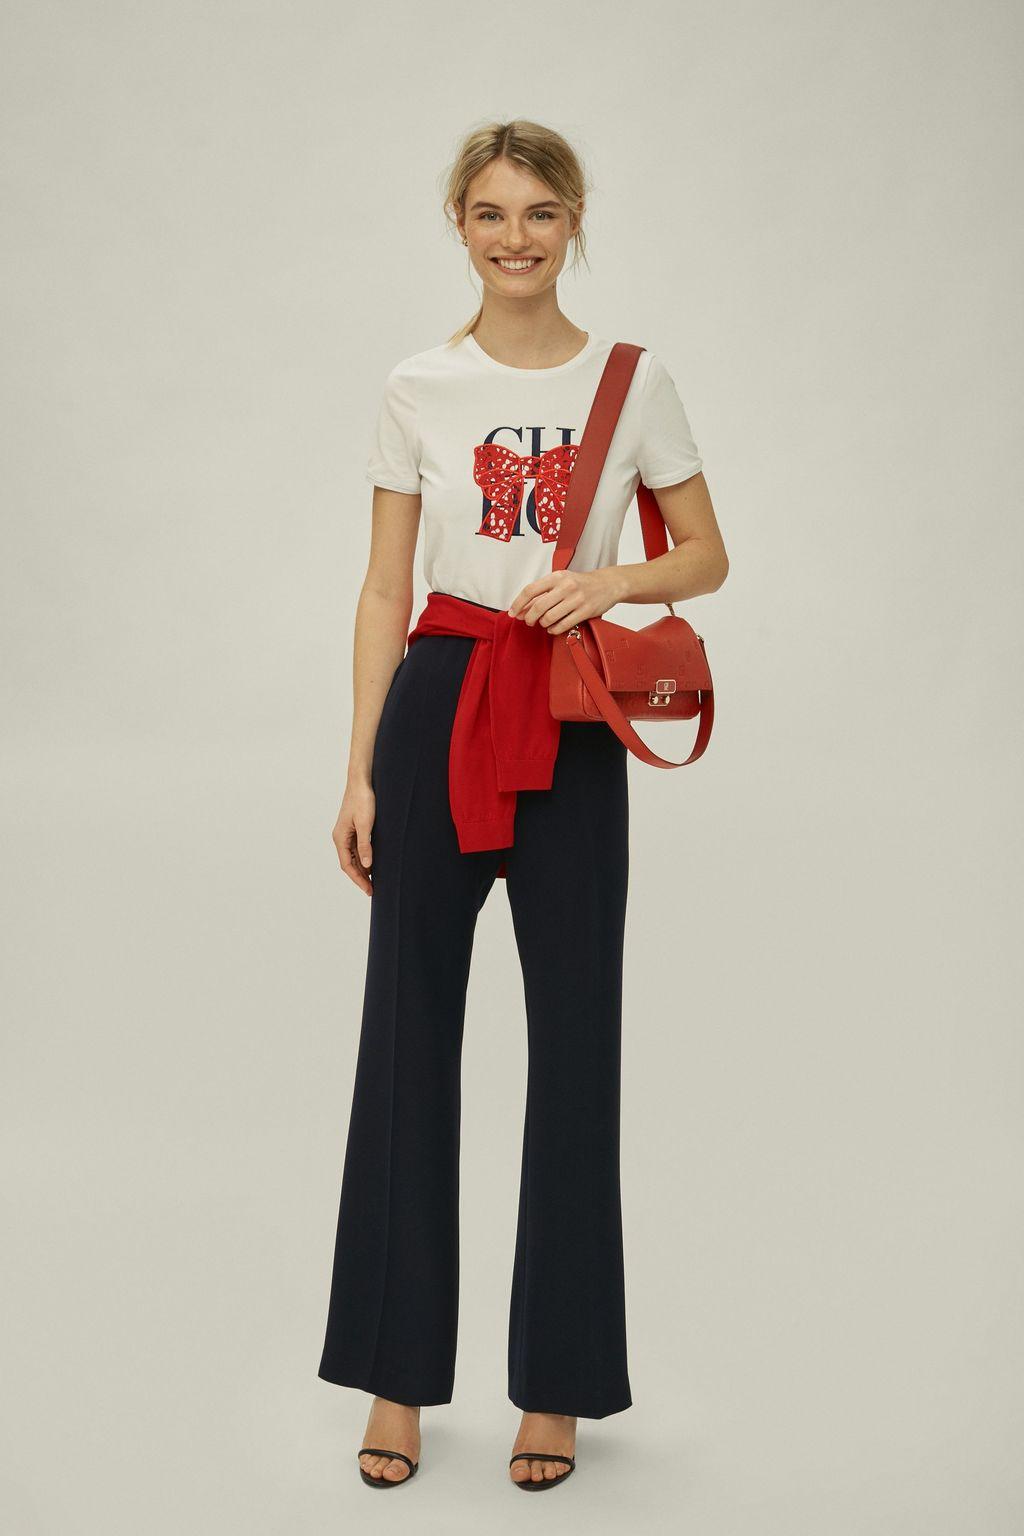 CH bow cotton t-shirt